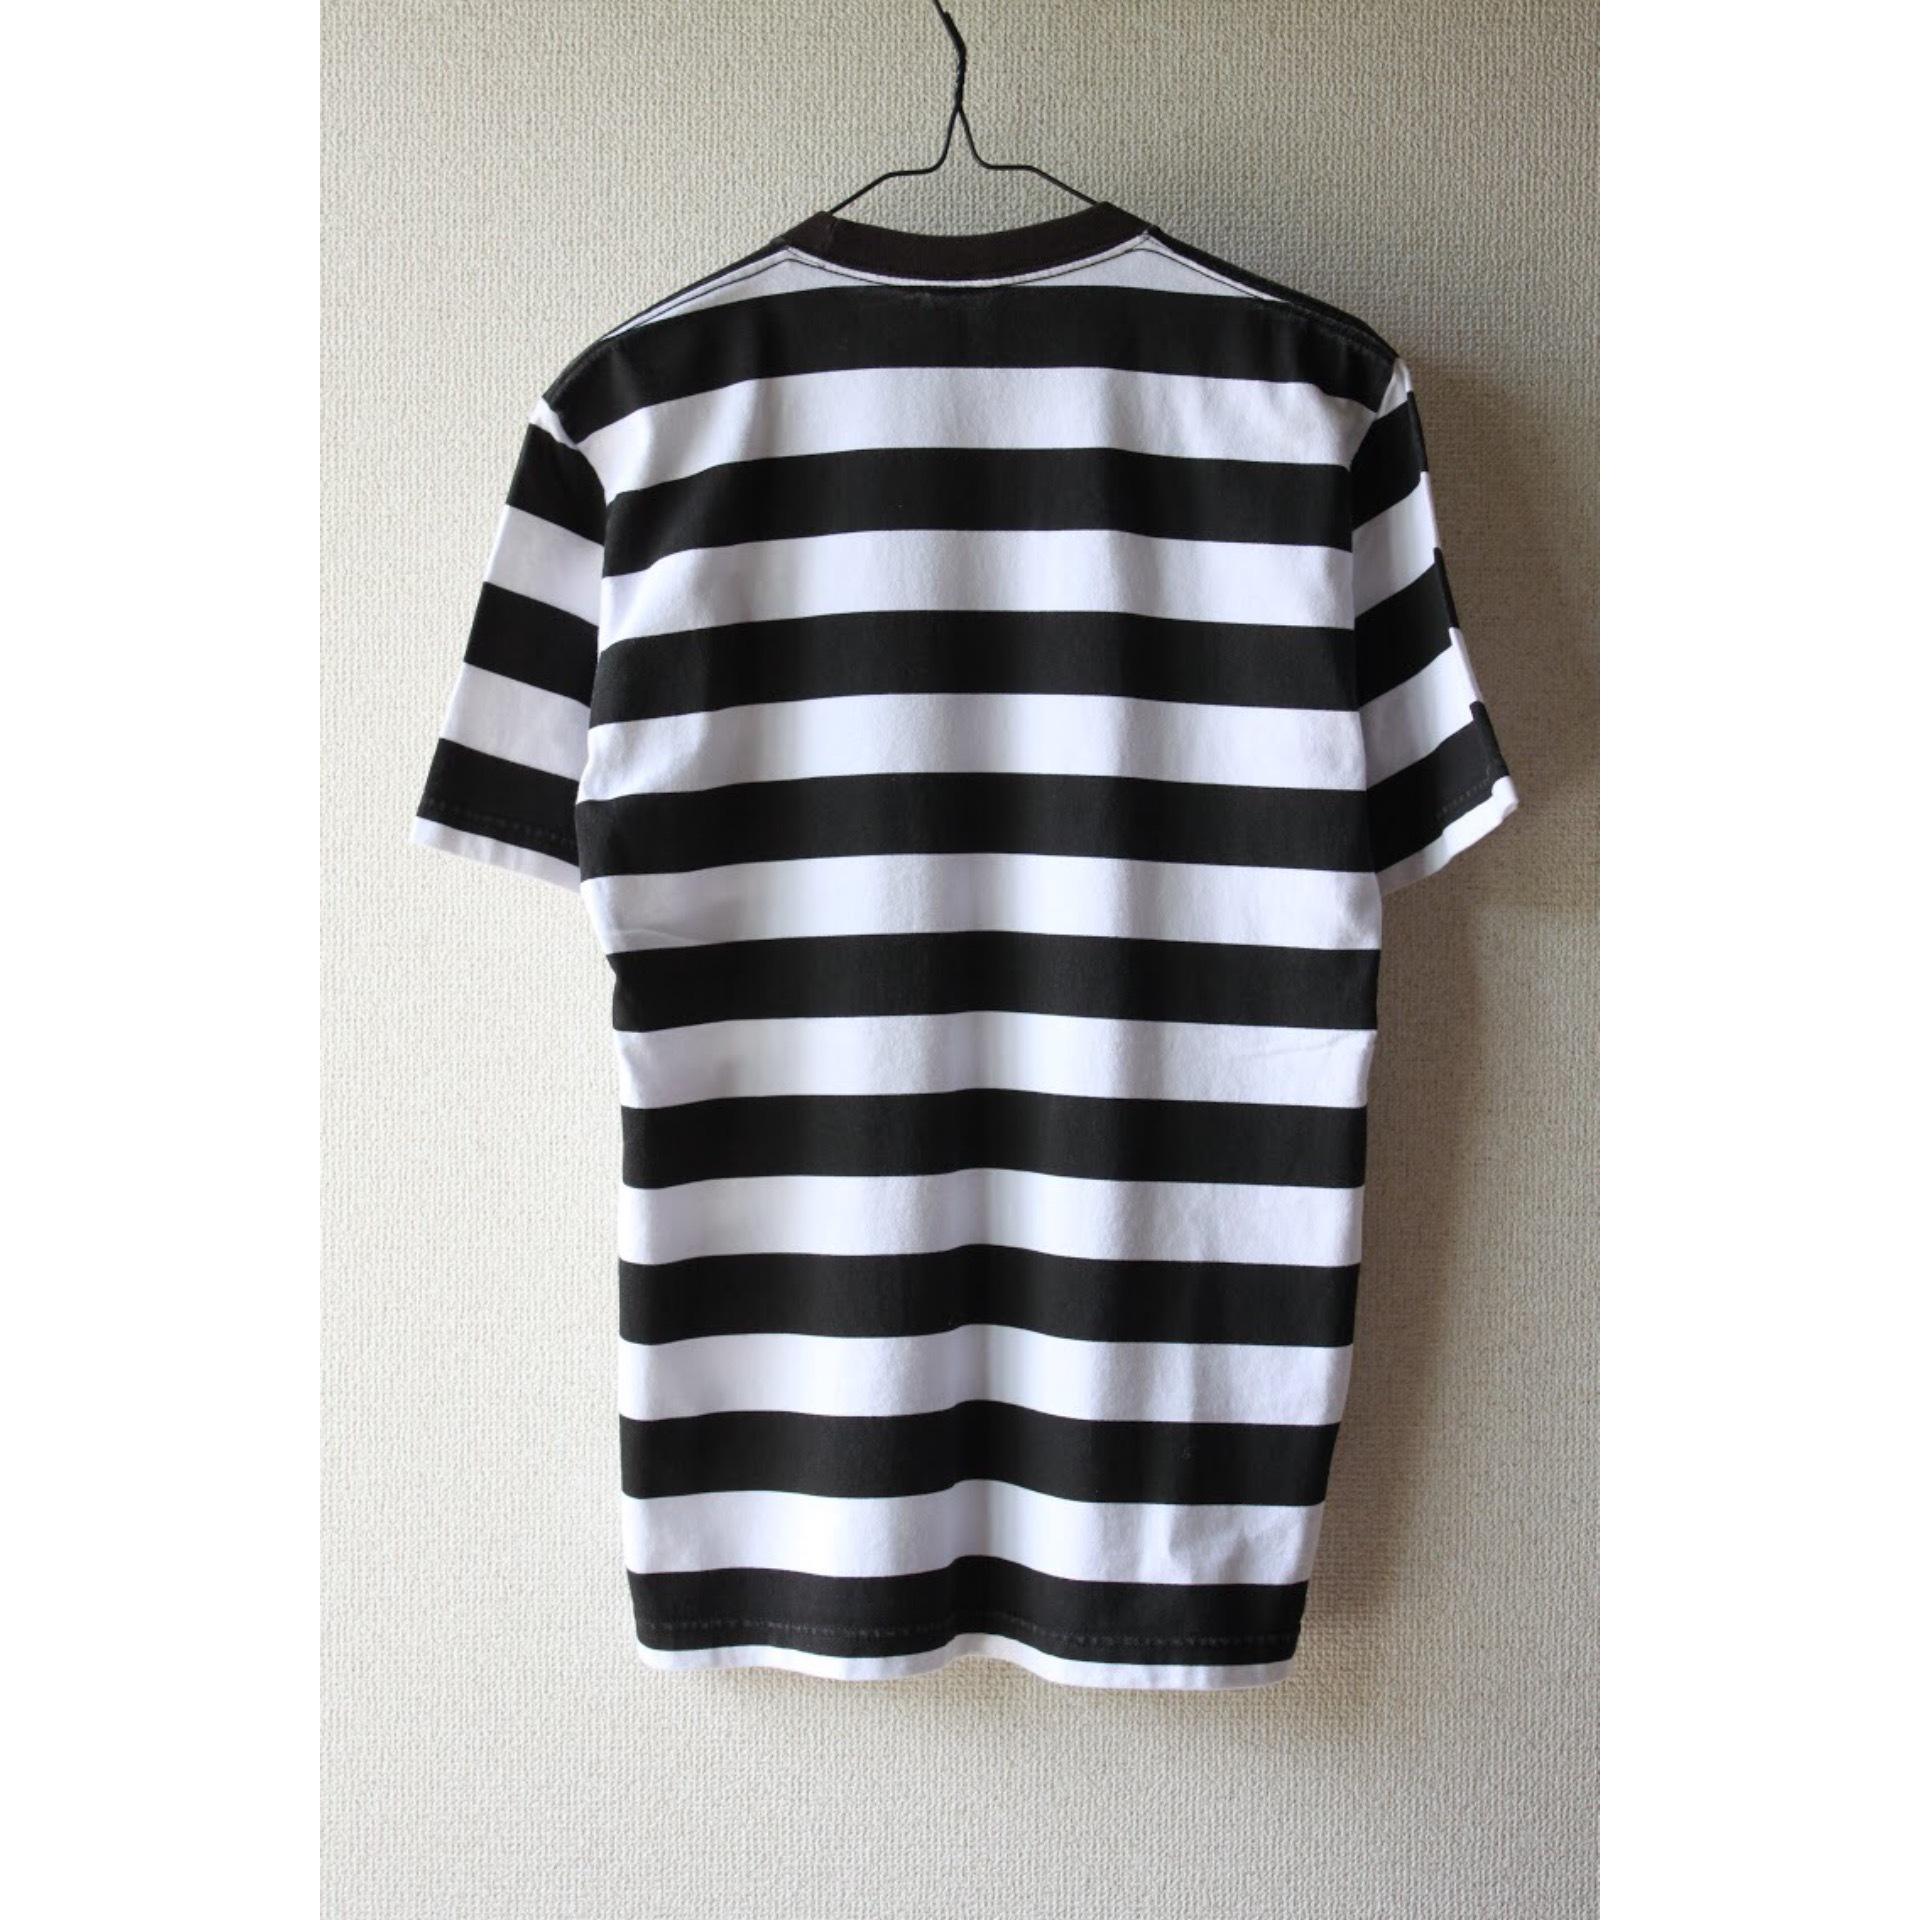 Vintage border t shirt